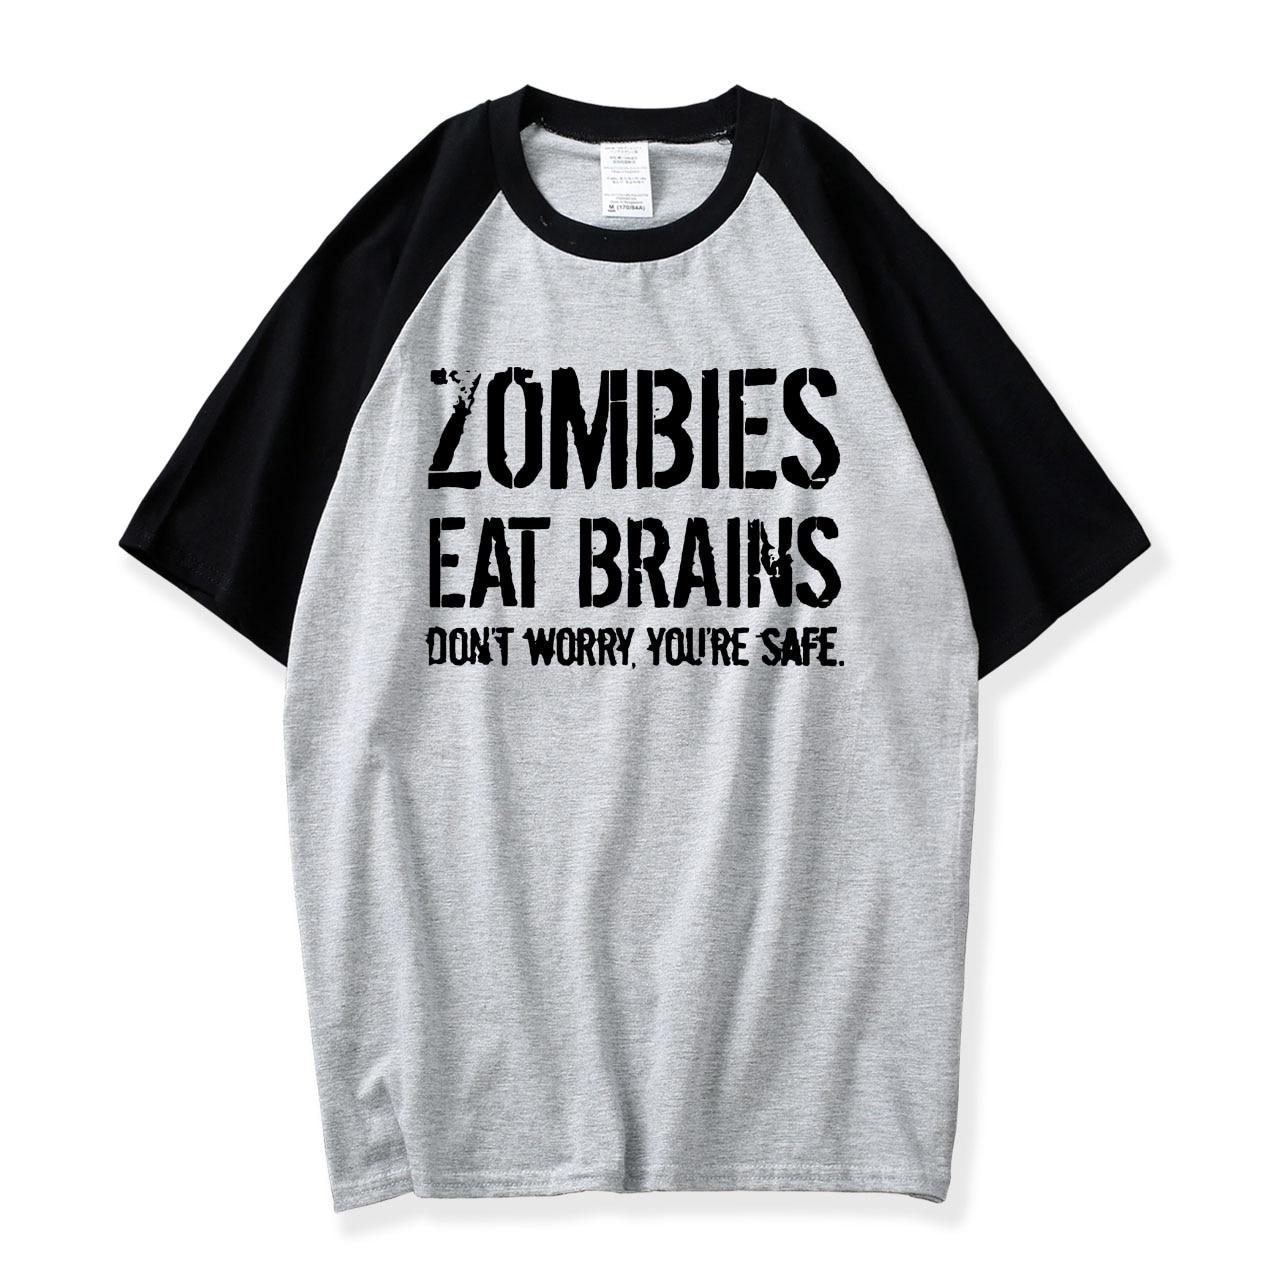 Crazy Dog Tshirts Mens Zombies Eat Brains So YouRe Safe T Shirt Men 2018 New Summer Raglan T-Shirts 100% Cotton O-neck Shirts